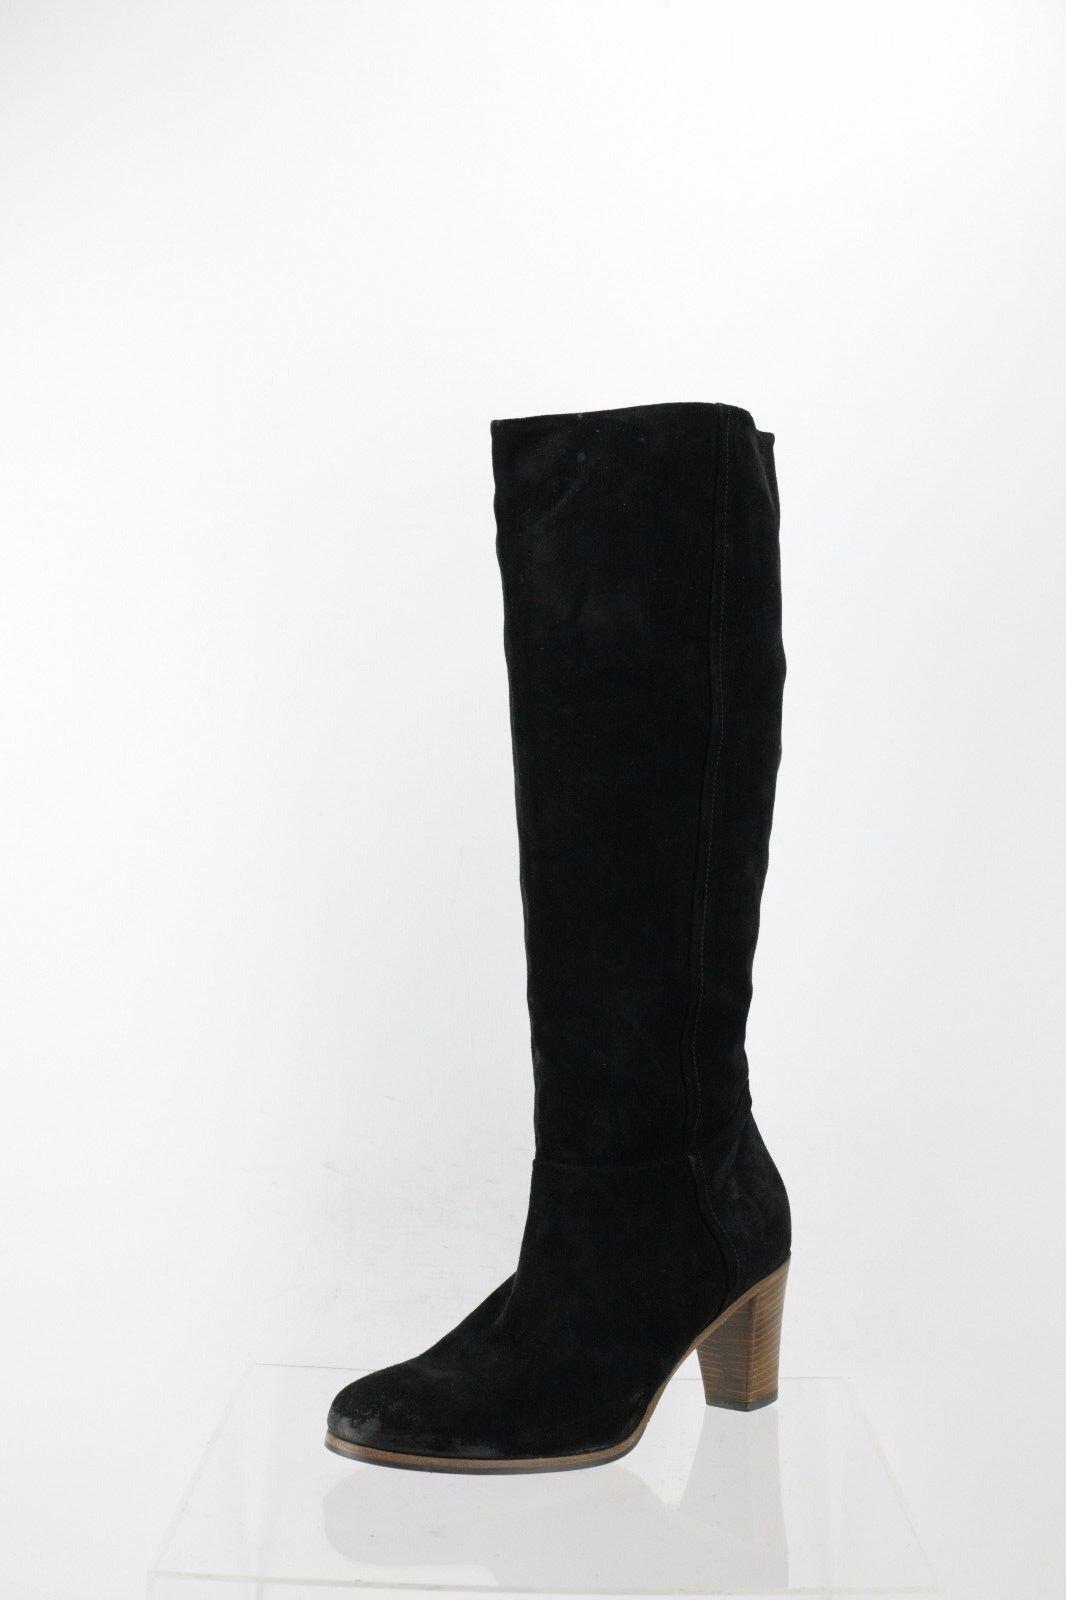 Alberto Fermani Loreo Black Suede Knee High Boot Women's Shoes Sz 39 NEW RTL$575